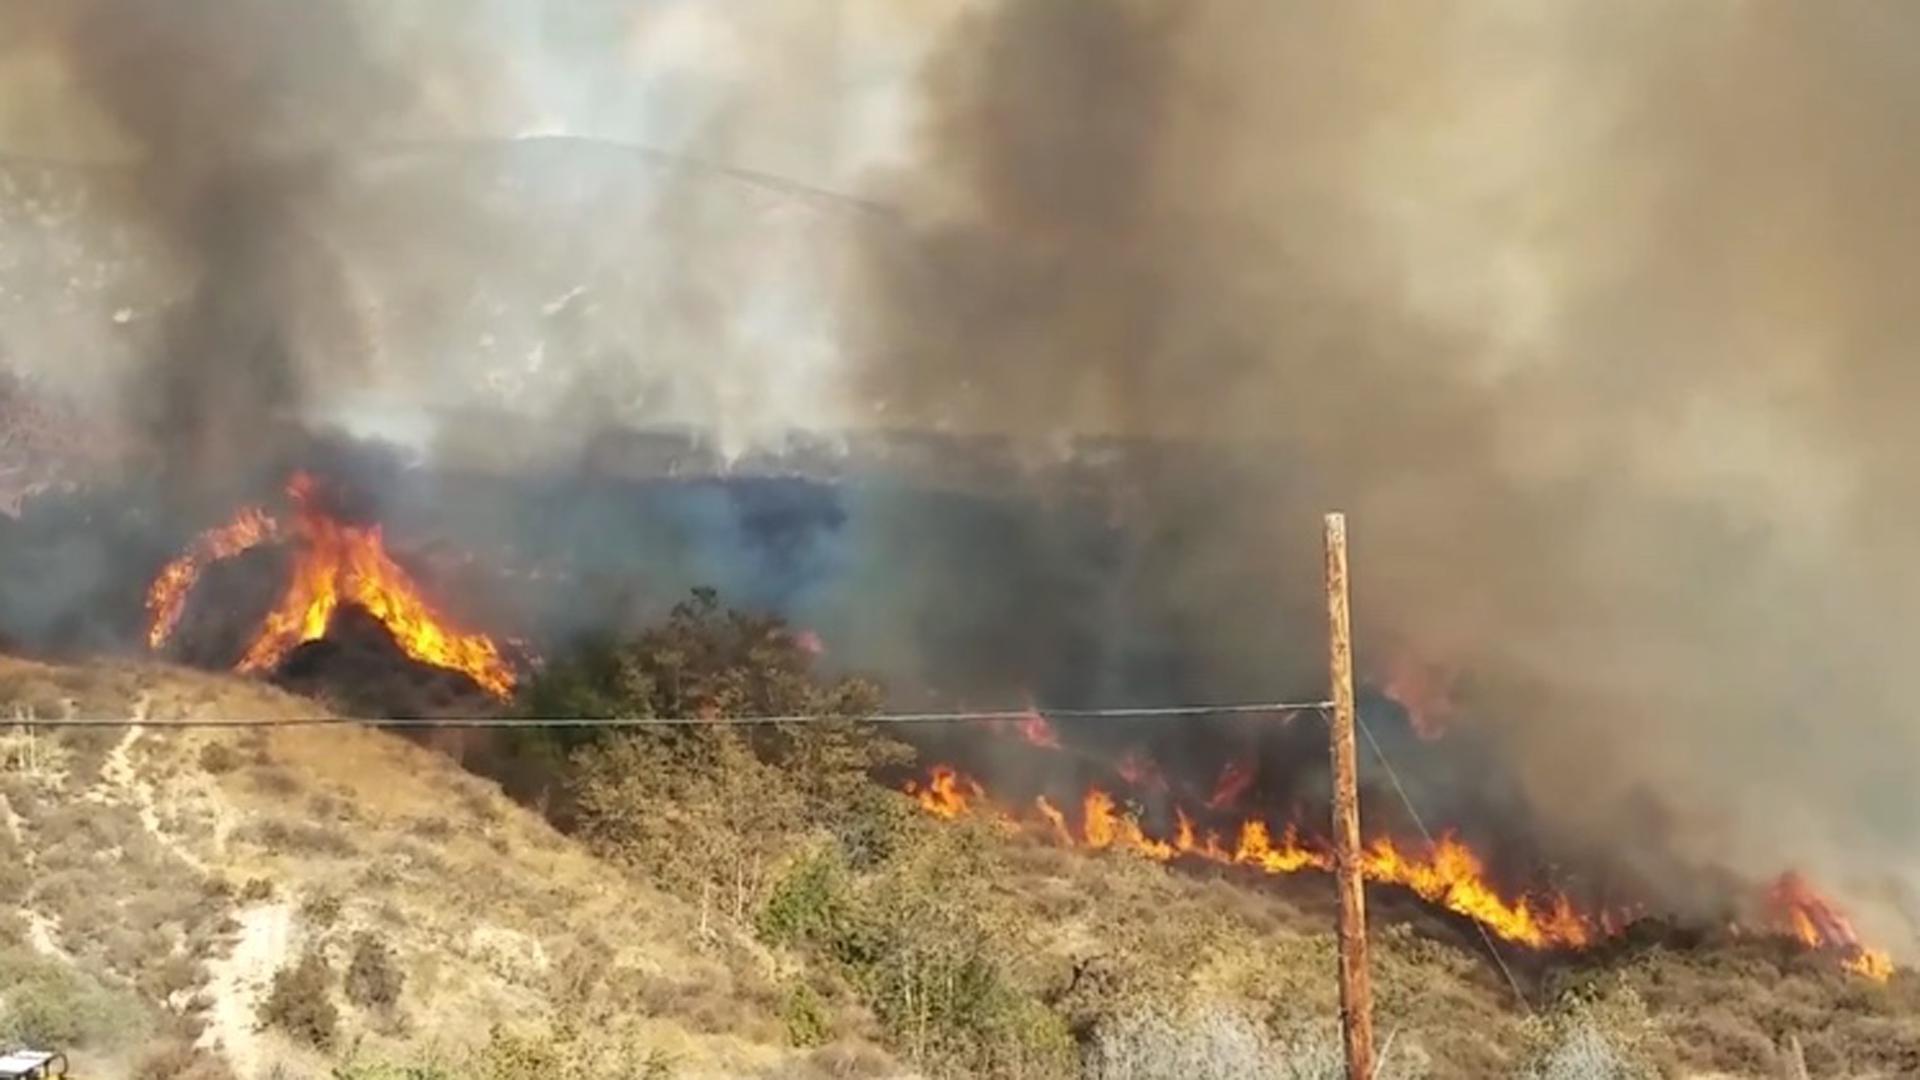 The North Park Fire burns through an area just north of CSU San Bernardino on Oct. 12, 2018. (Credit: Whitehill Productions)